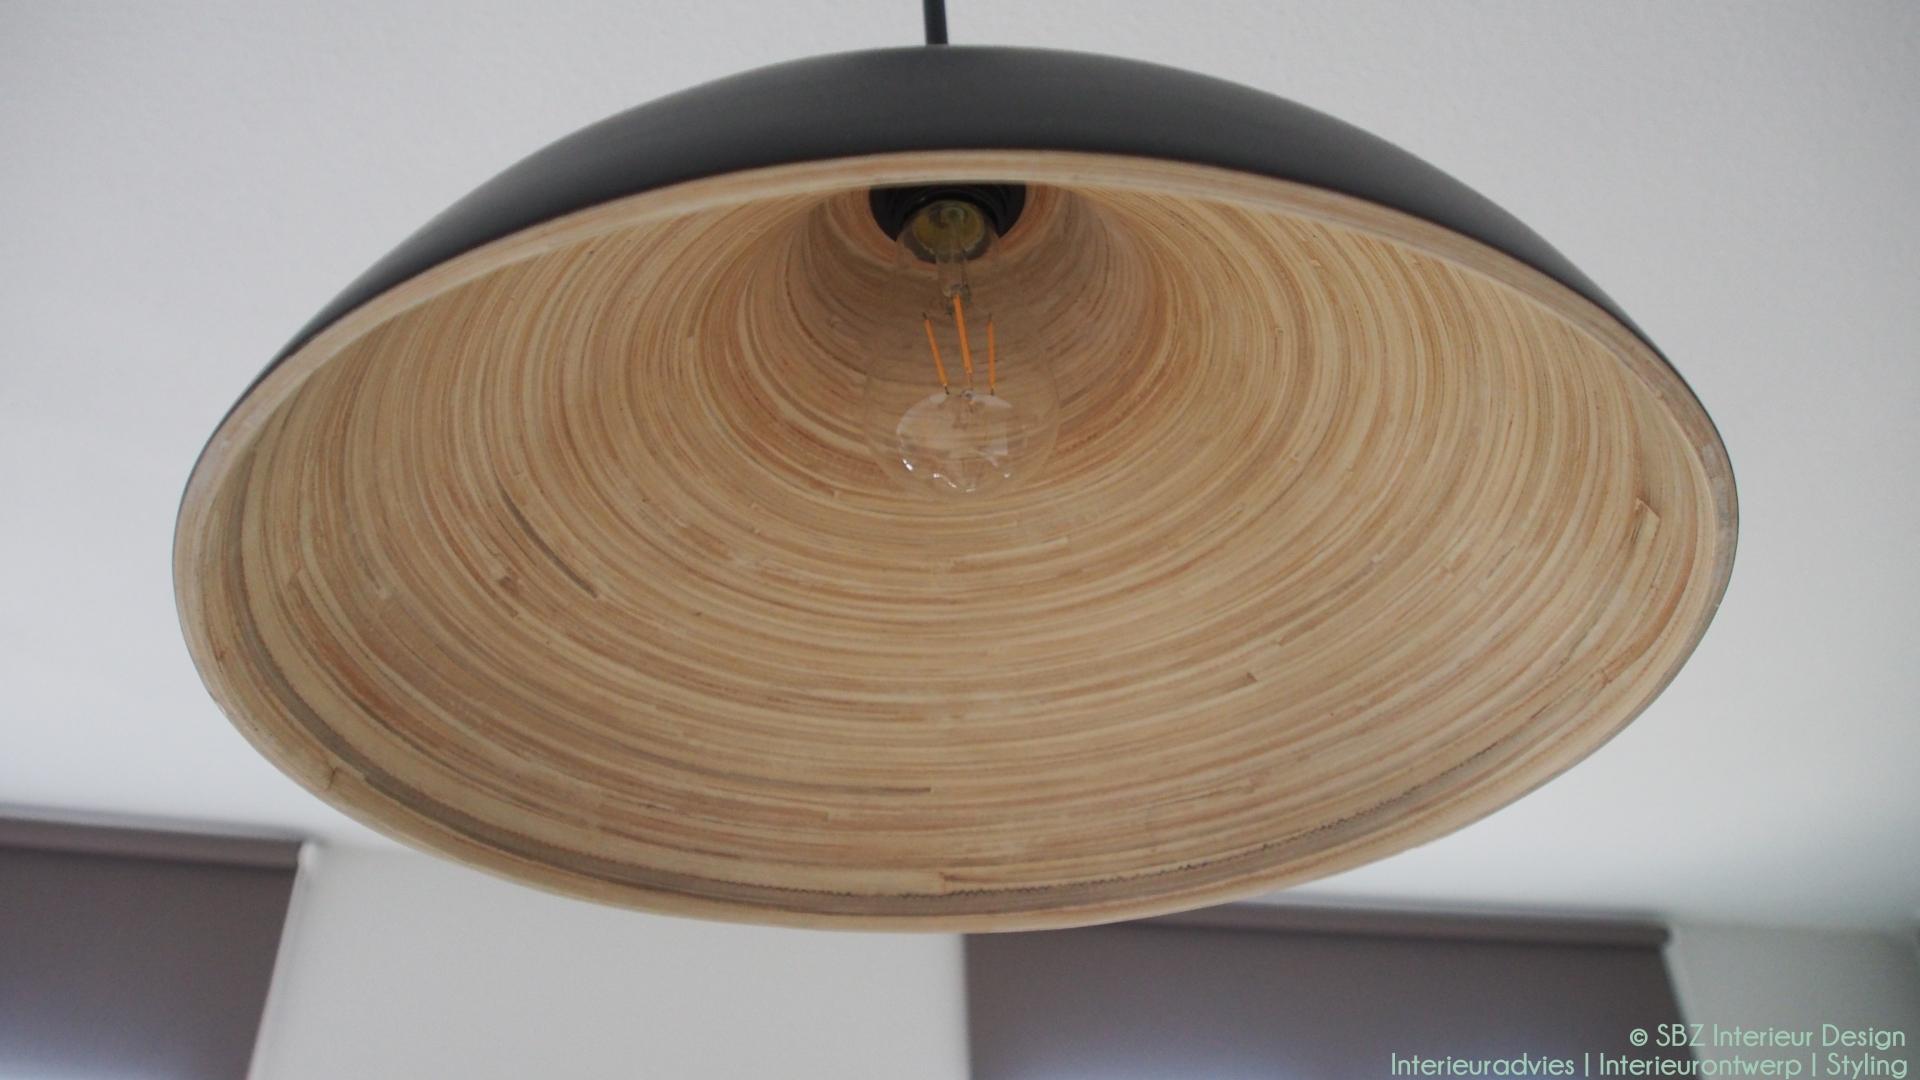 Interieur styling | Slaapkamer make-over in Amstelveen - SBZ Interieur Design (www.sbzinterieurdesign.nl)